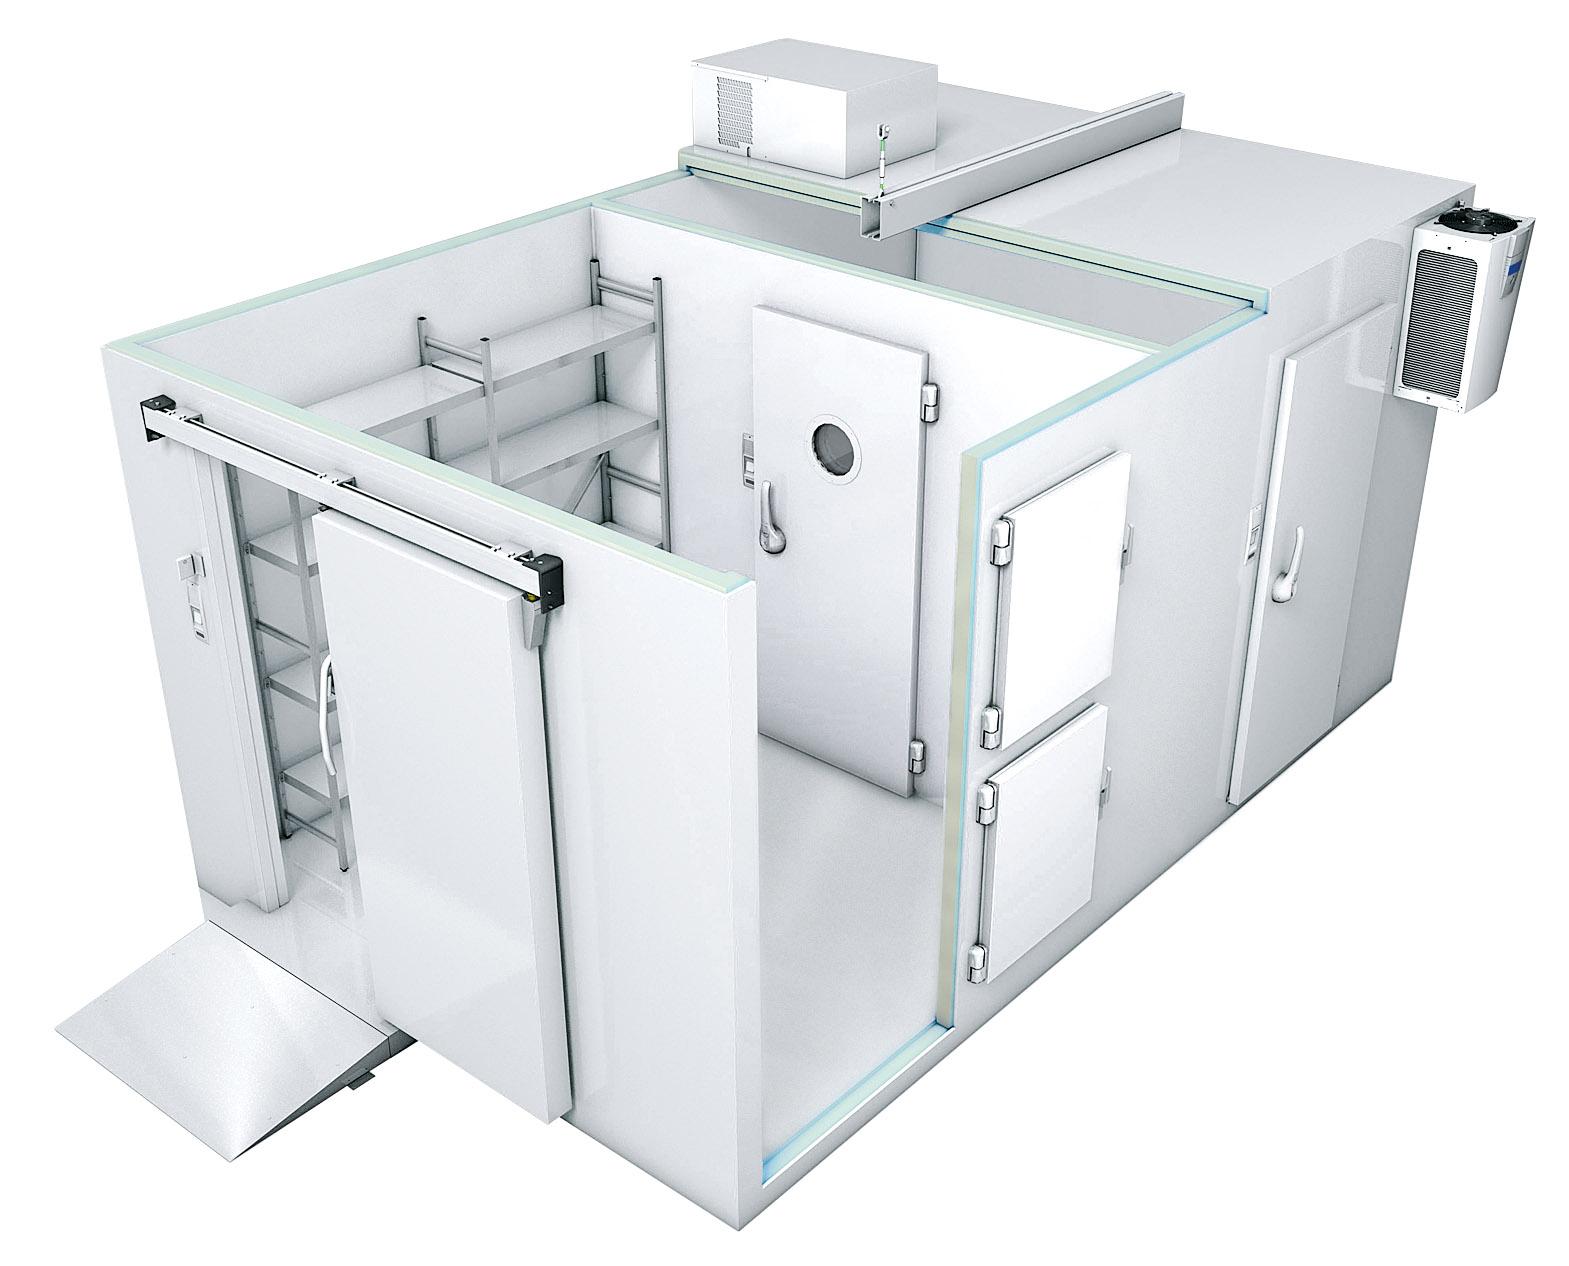 Viessmann Tecto Cold Room Propel Technology Ltd